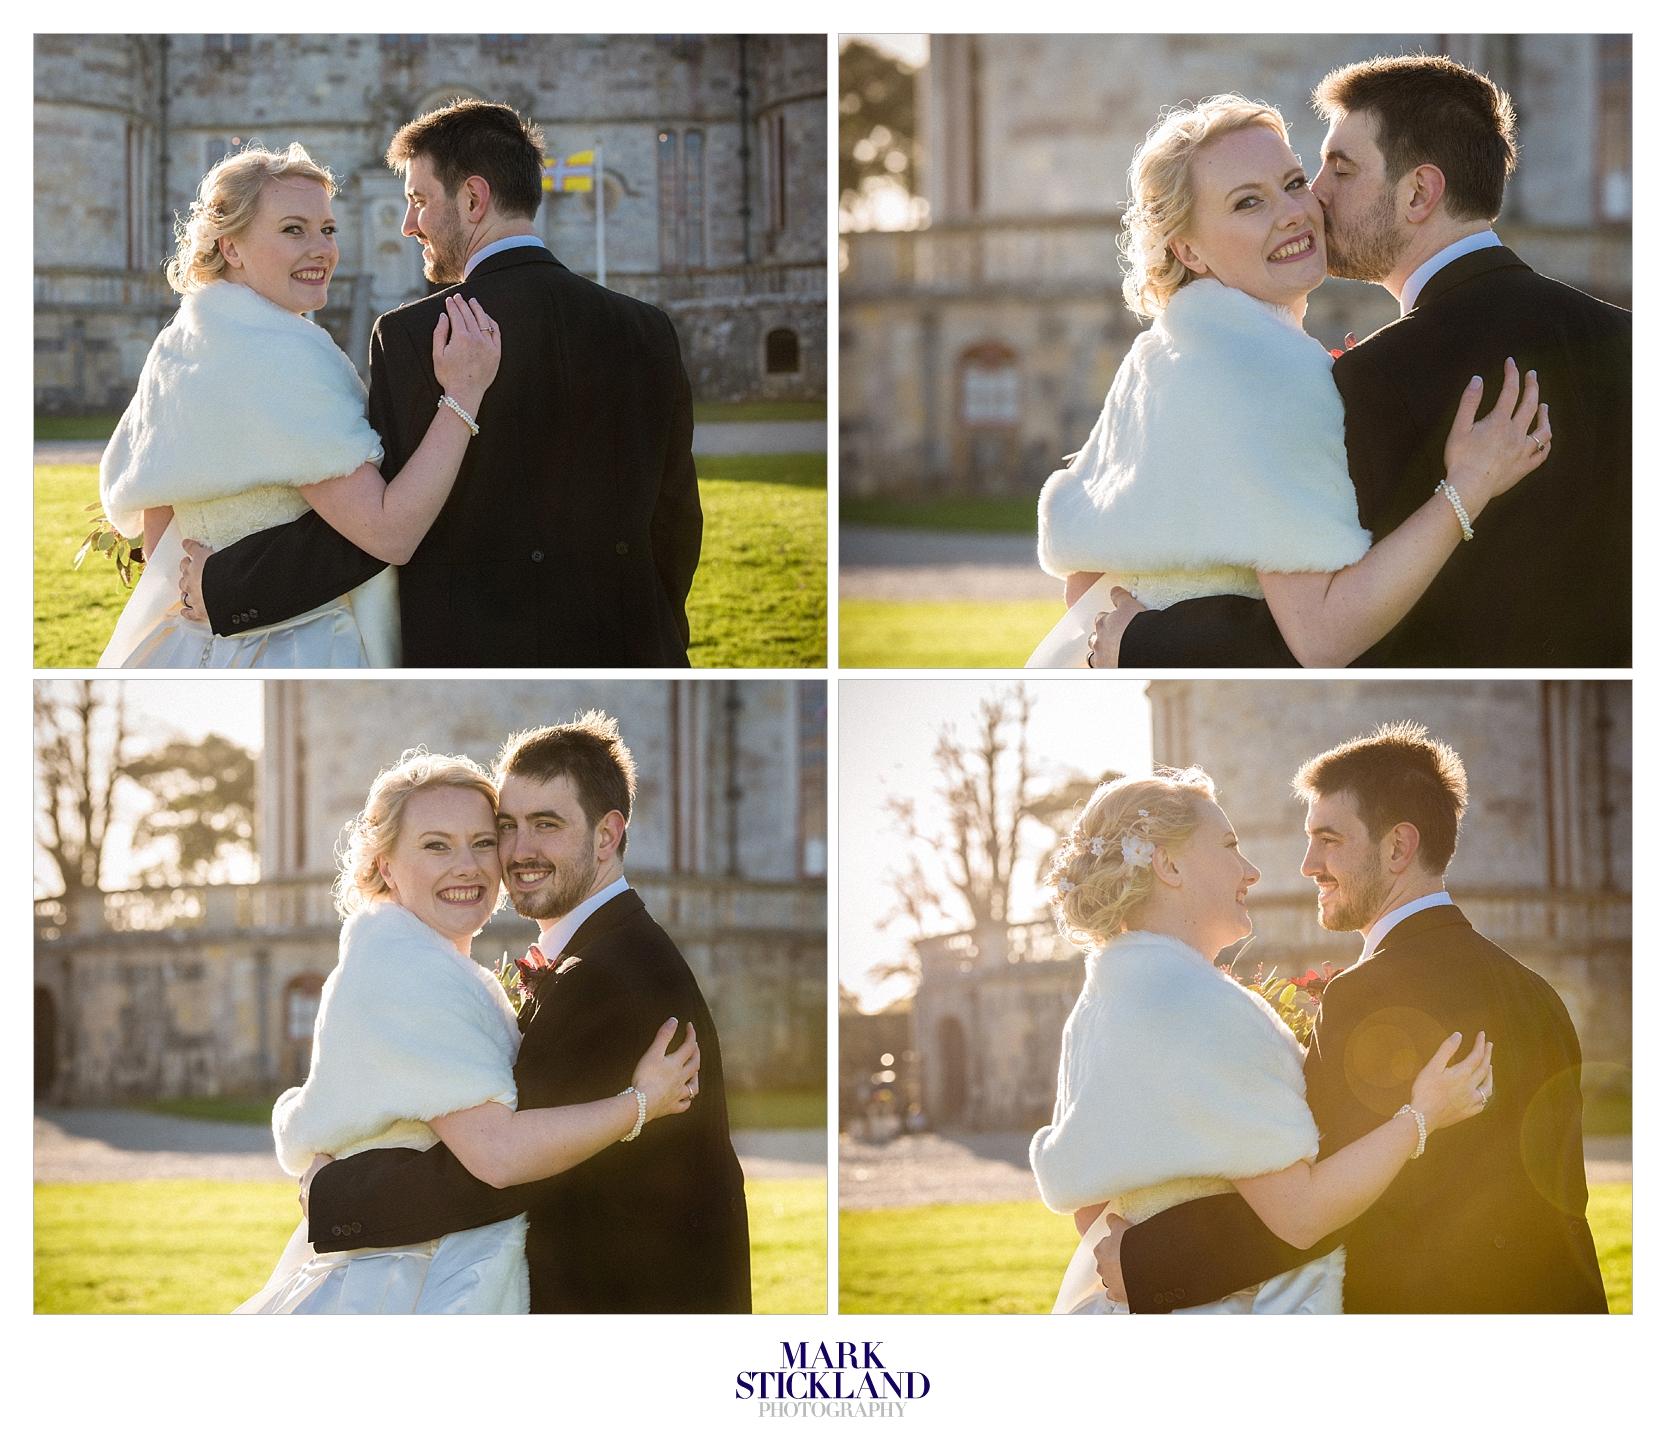 lulworth_castle_wedding_dorset_mark stickland photography.27